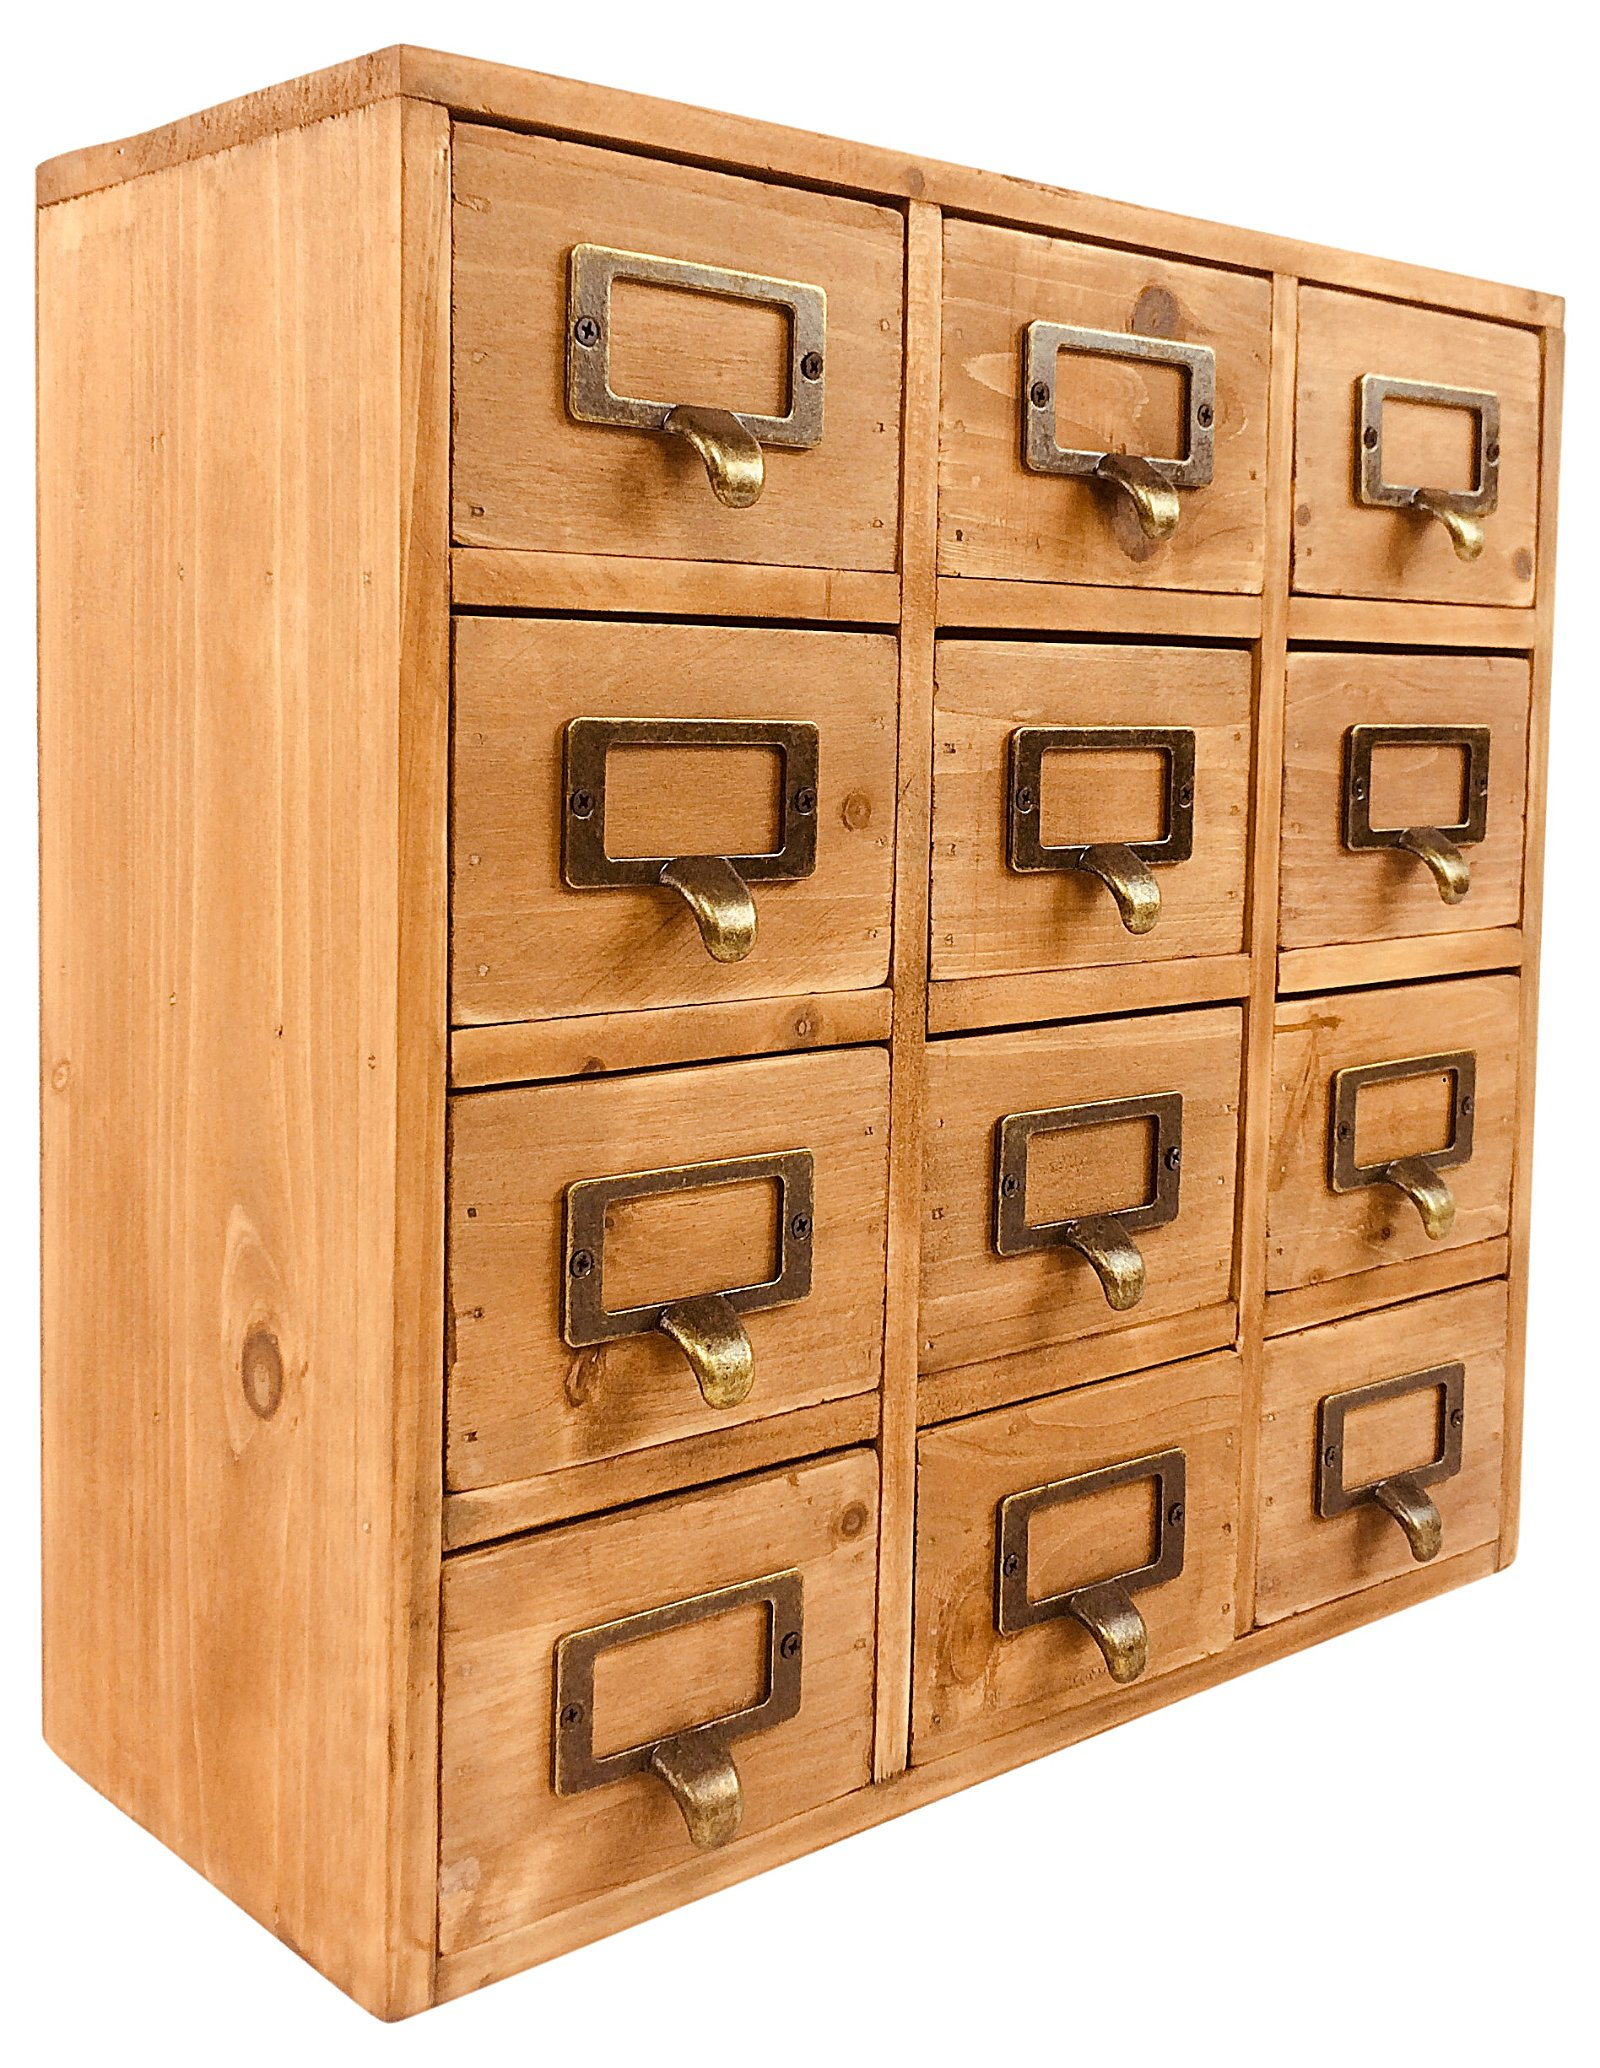 Storage Drawers (12 drawers) 35 x 15 x 34cm